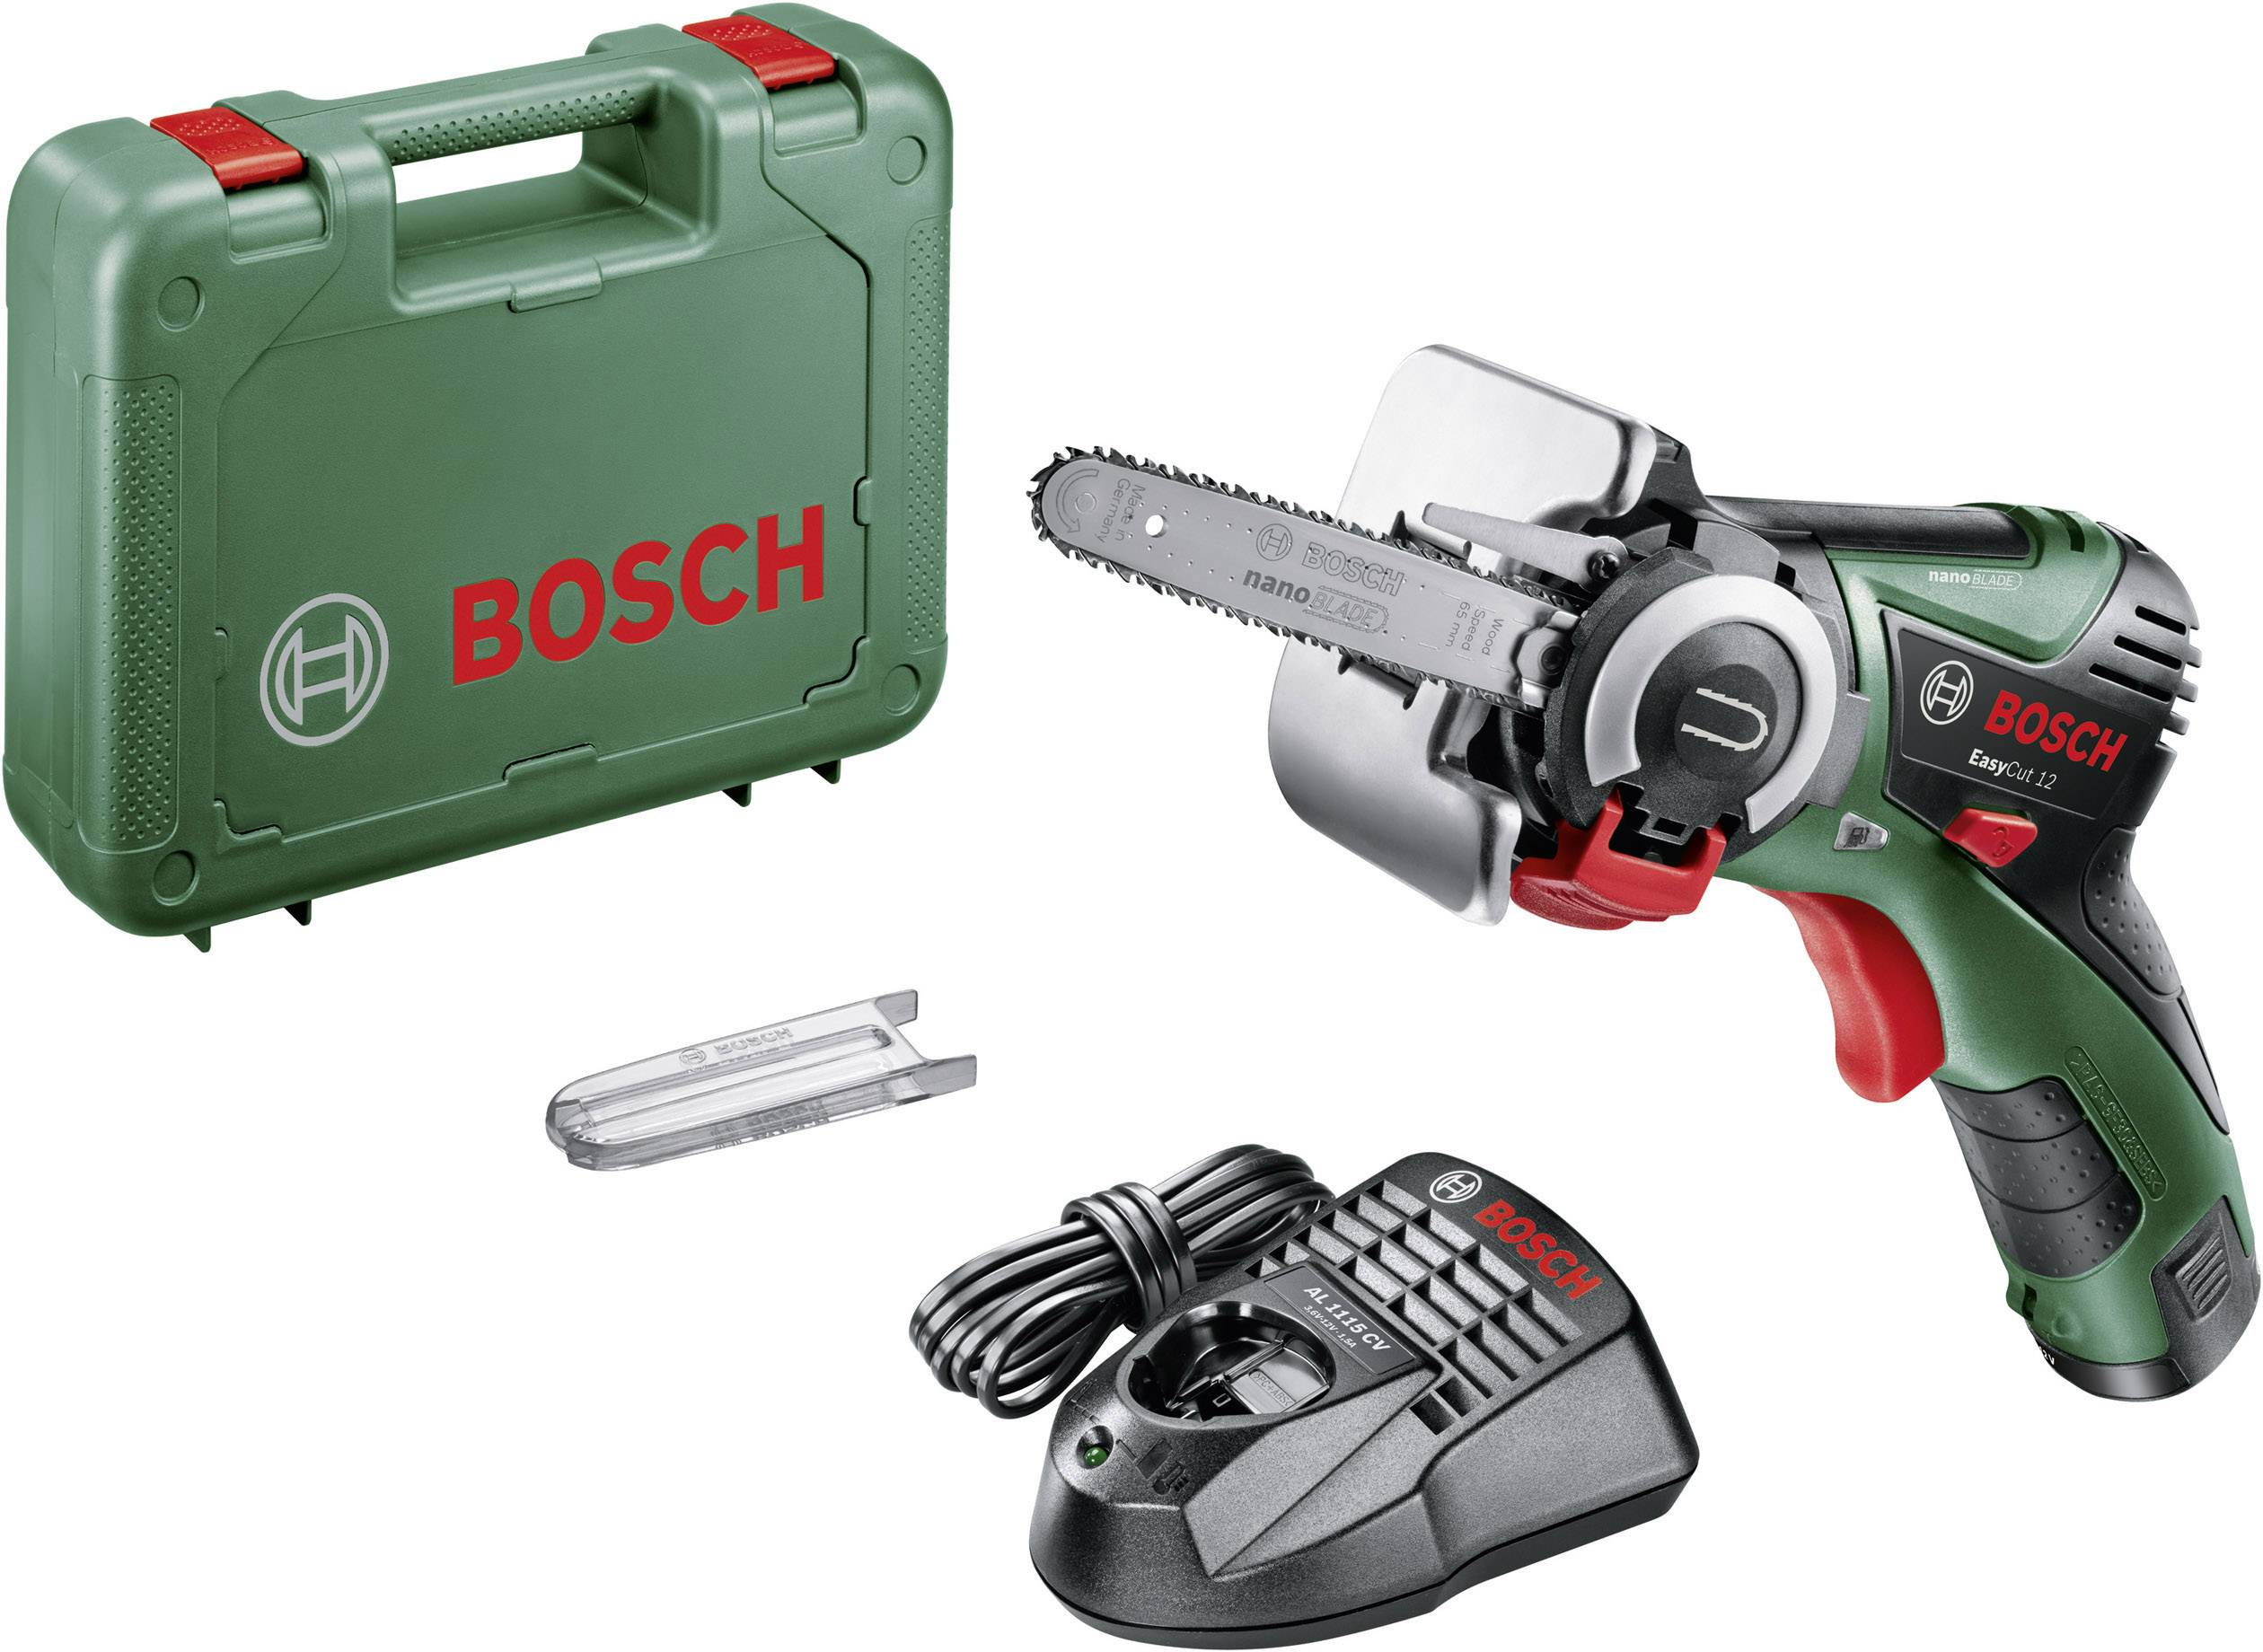 bosch home and garden easycut 12 akku multisaege inkl akku inkl koffer 12 v 2 5 ah